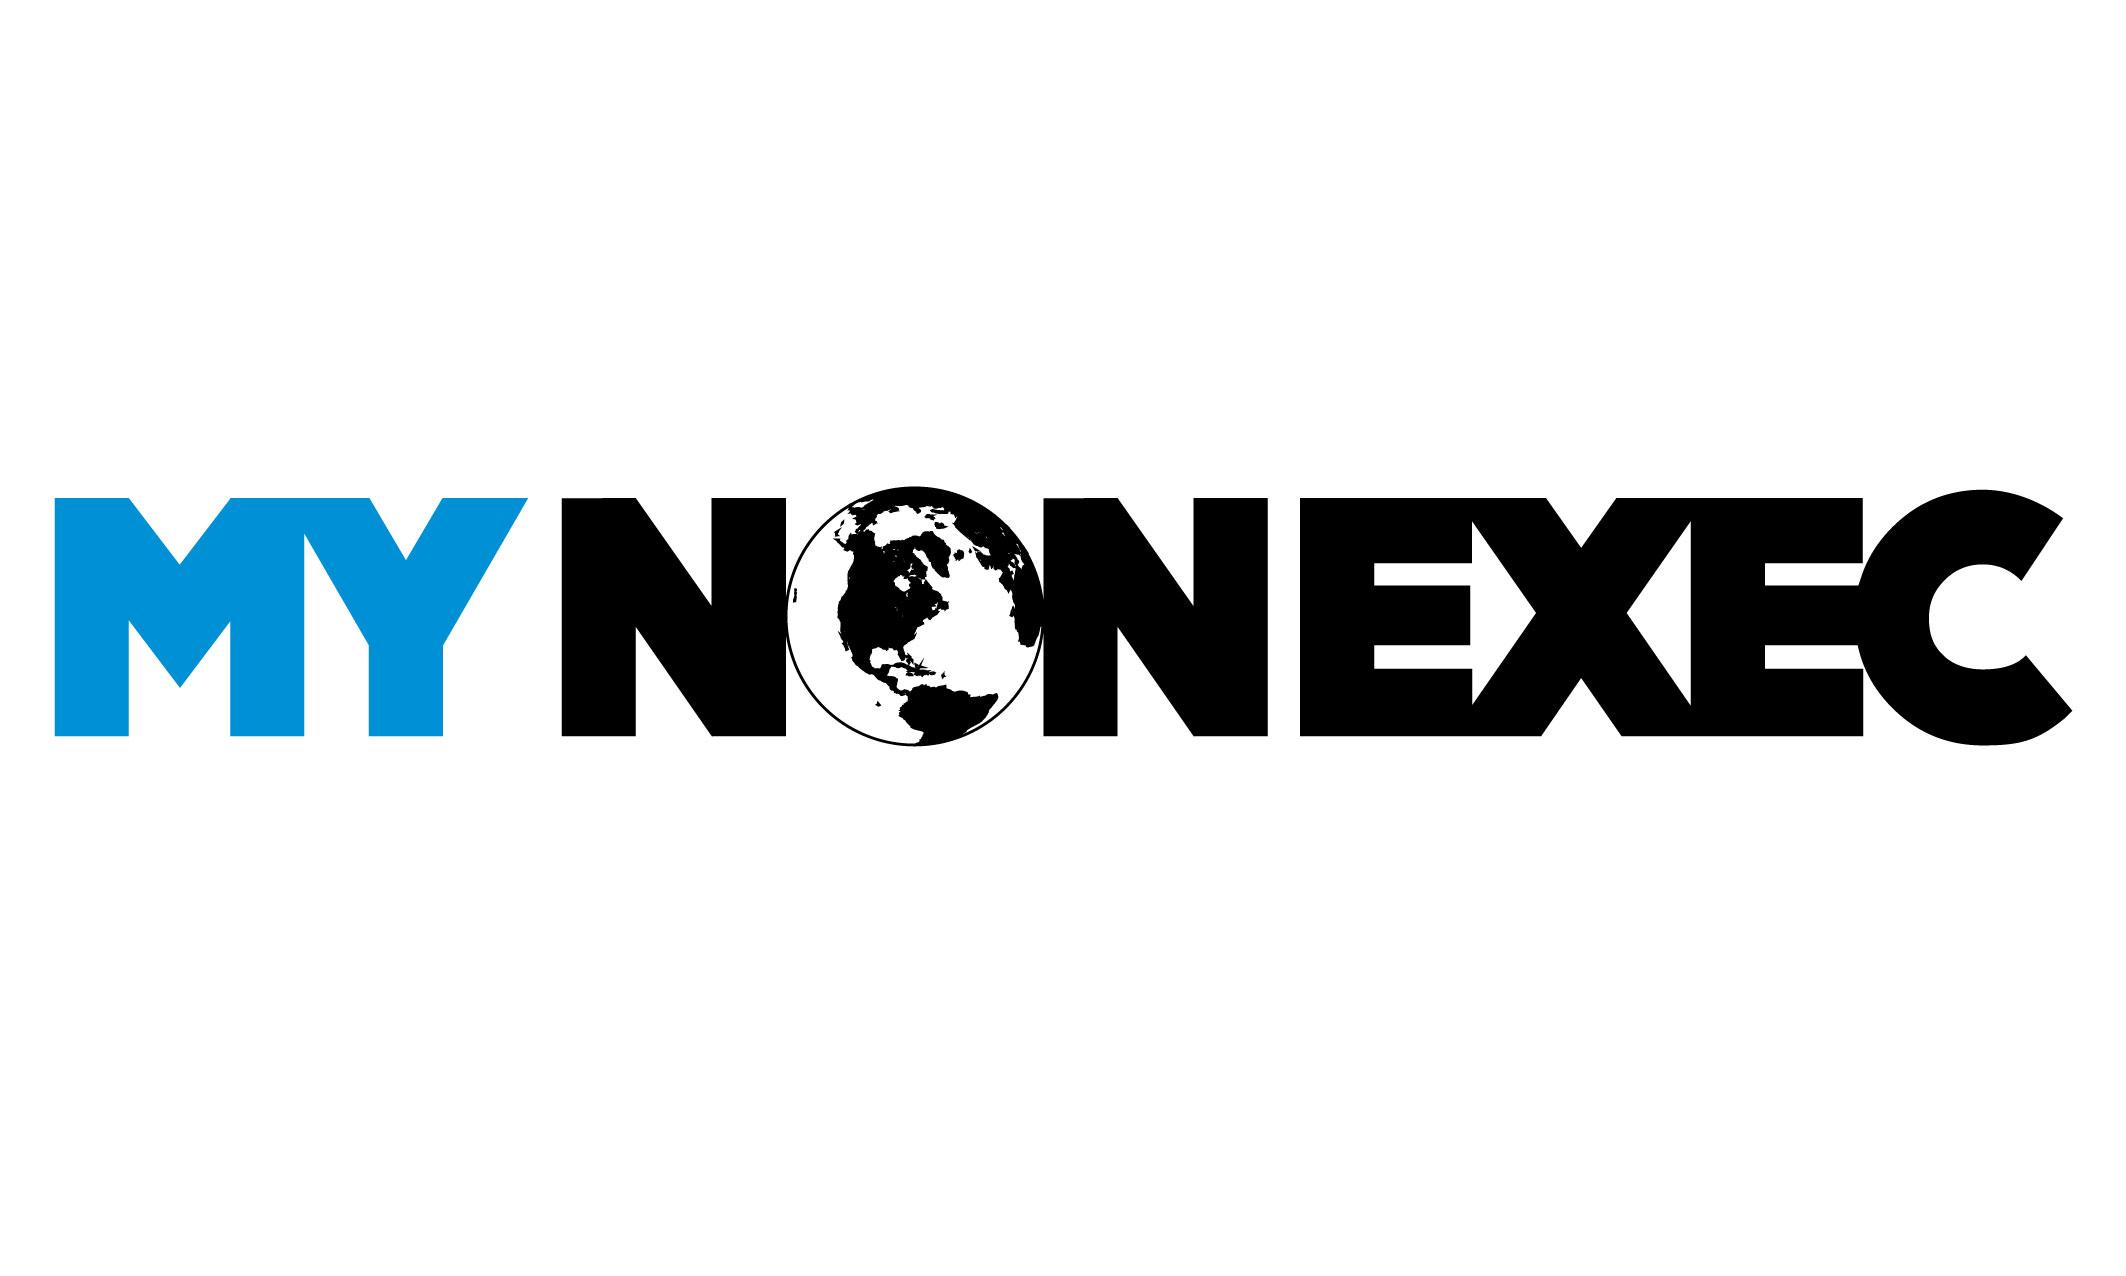 Mynonexec_logo.jpg